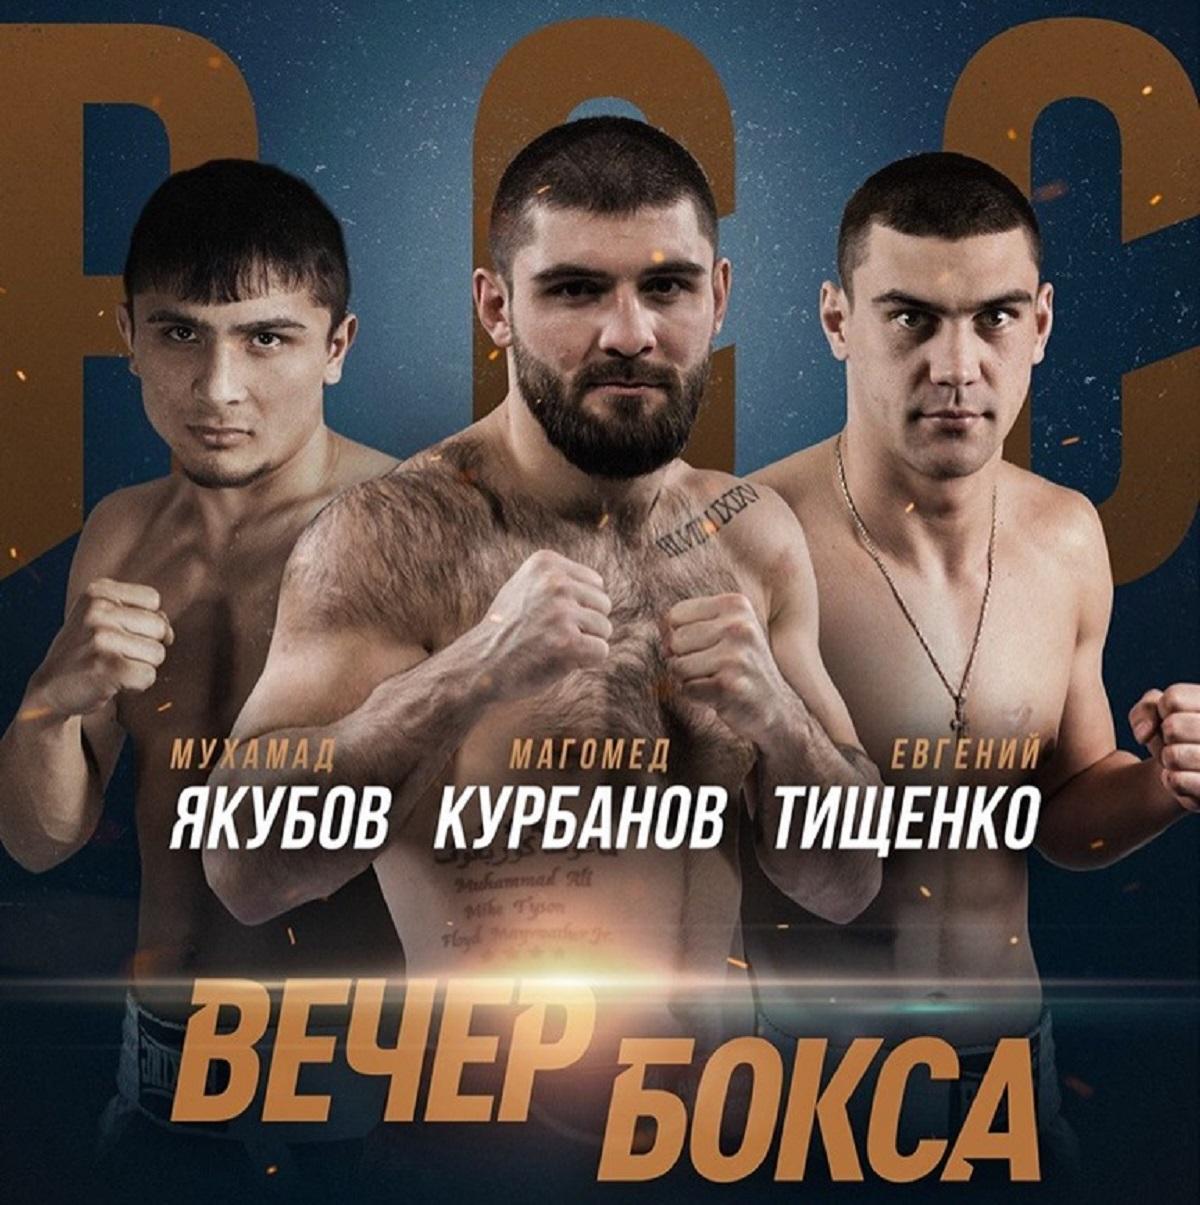 Боксерский турнир - Академия единоборств РМК